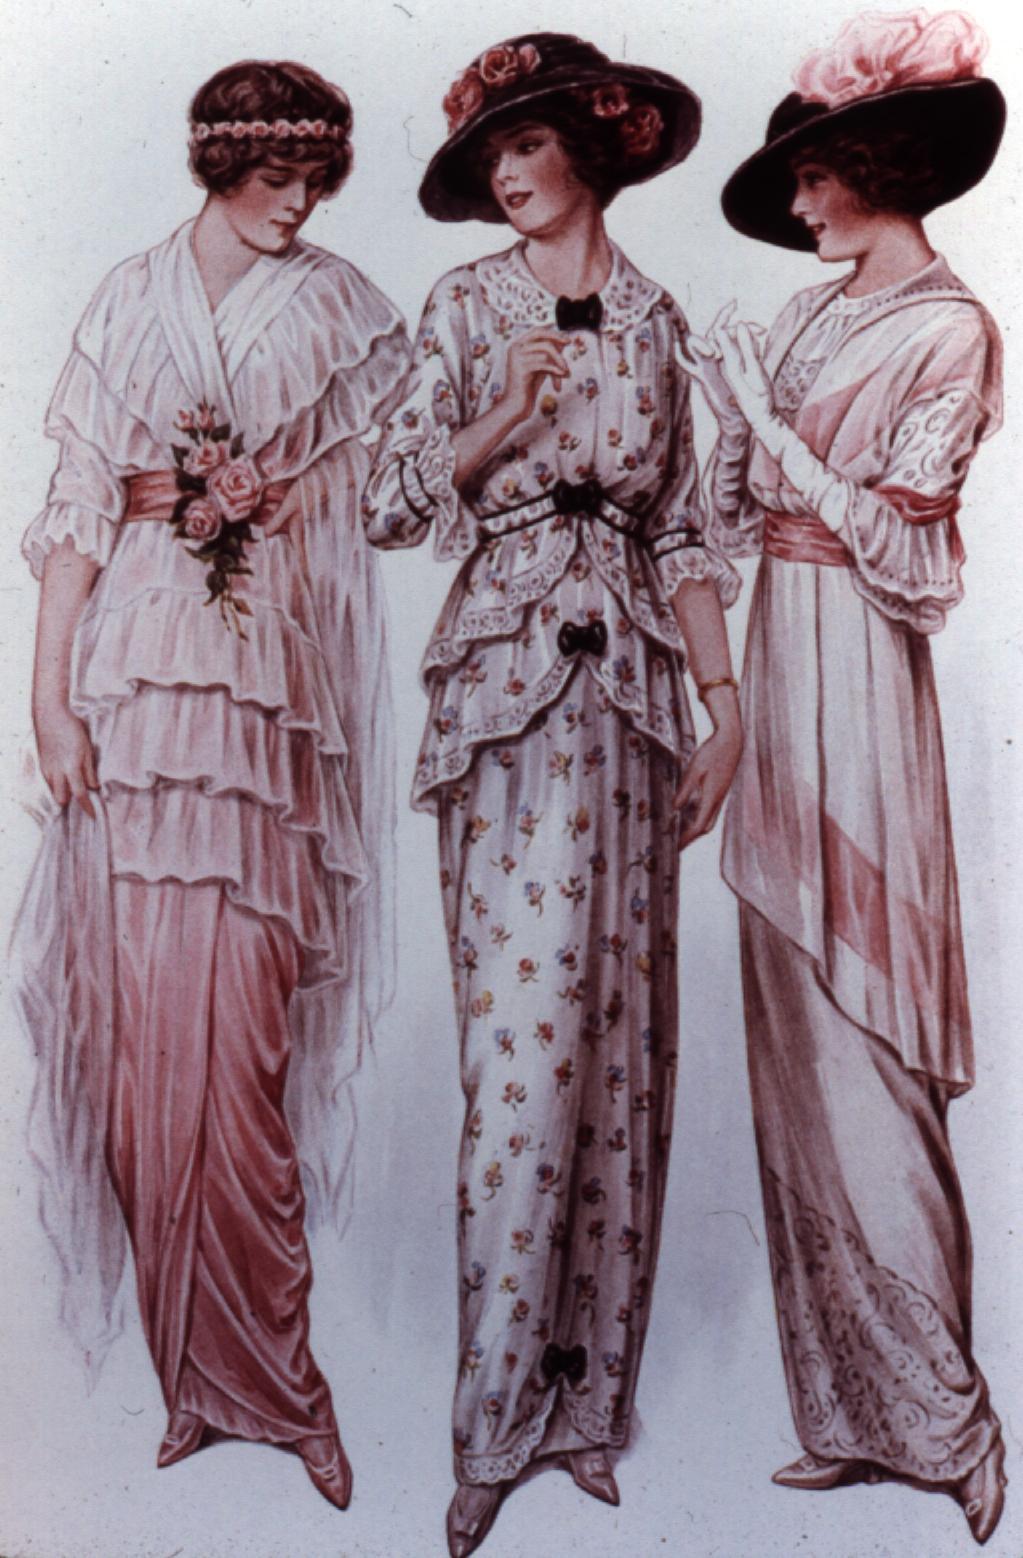 Hist Ria Da Moda S Culo Xix Parte 3 Moda Na Belle Poque E Era Eduardiana